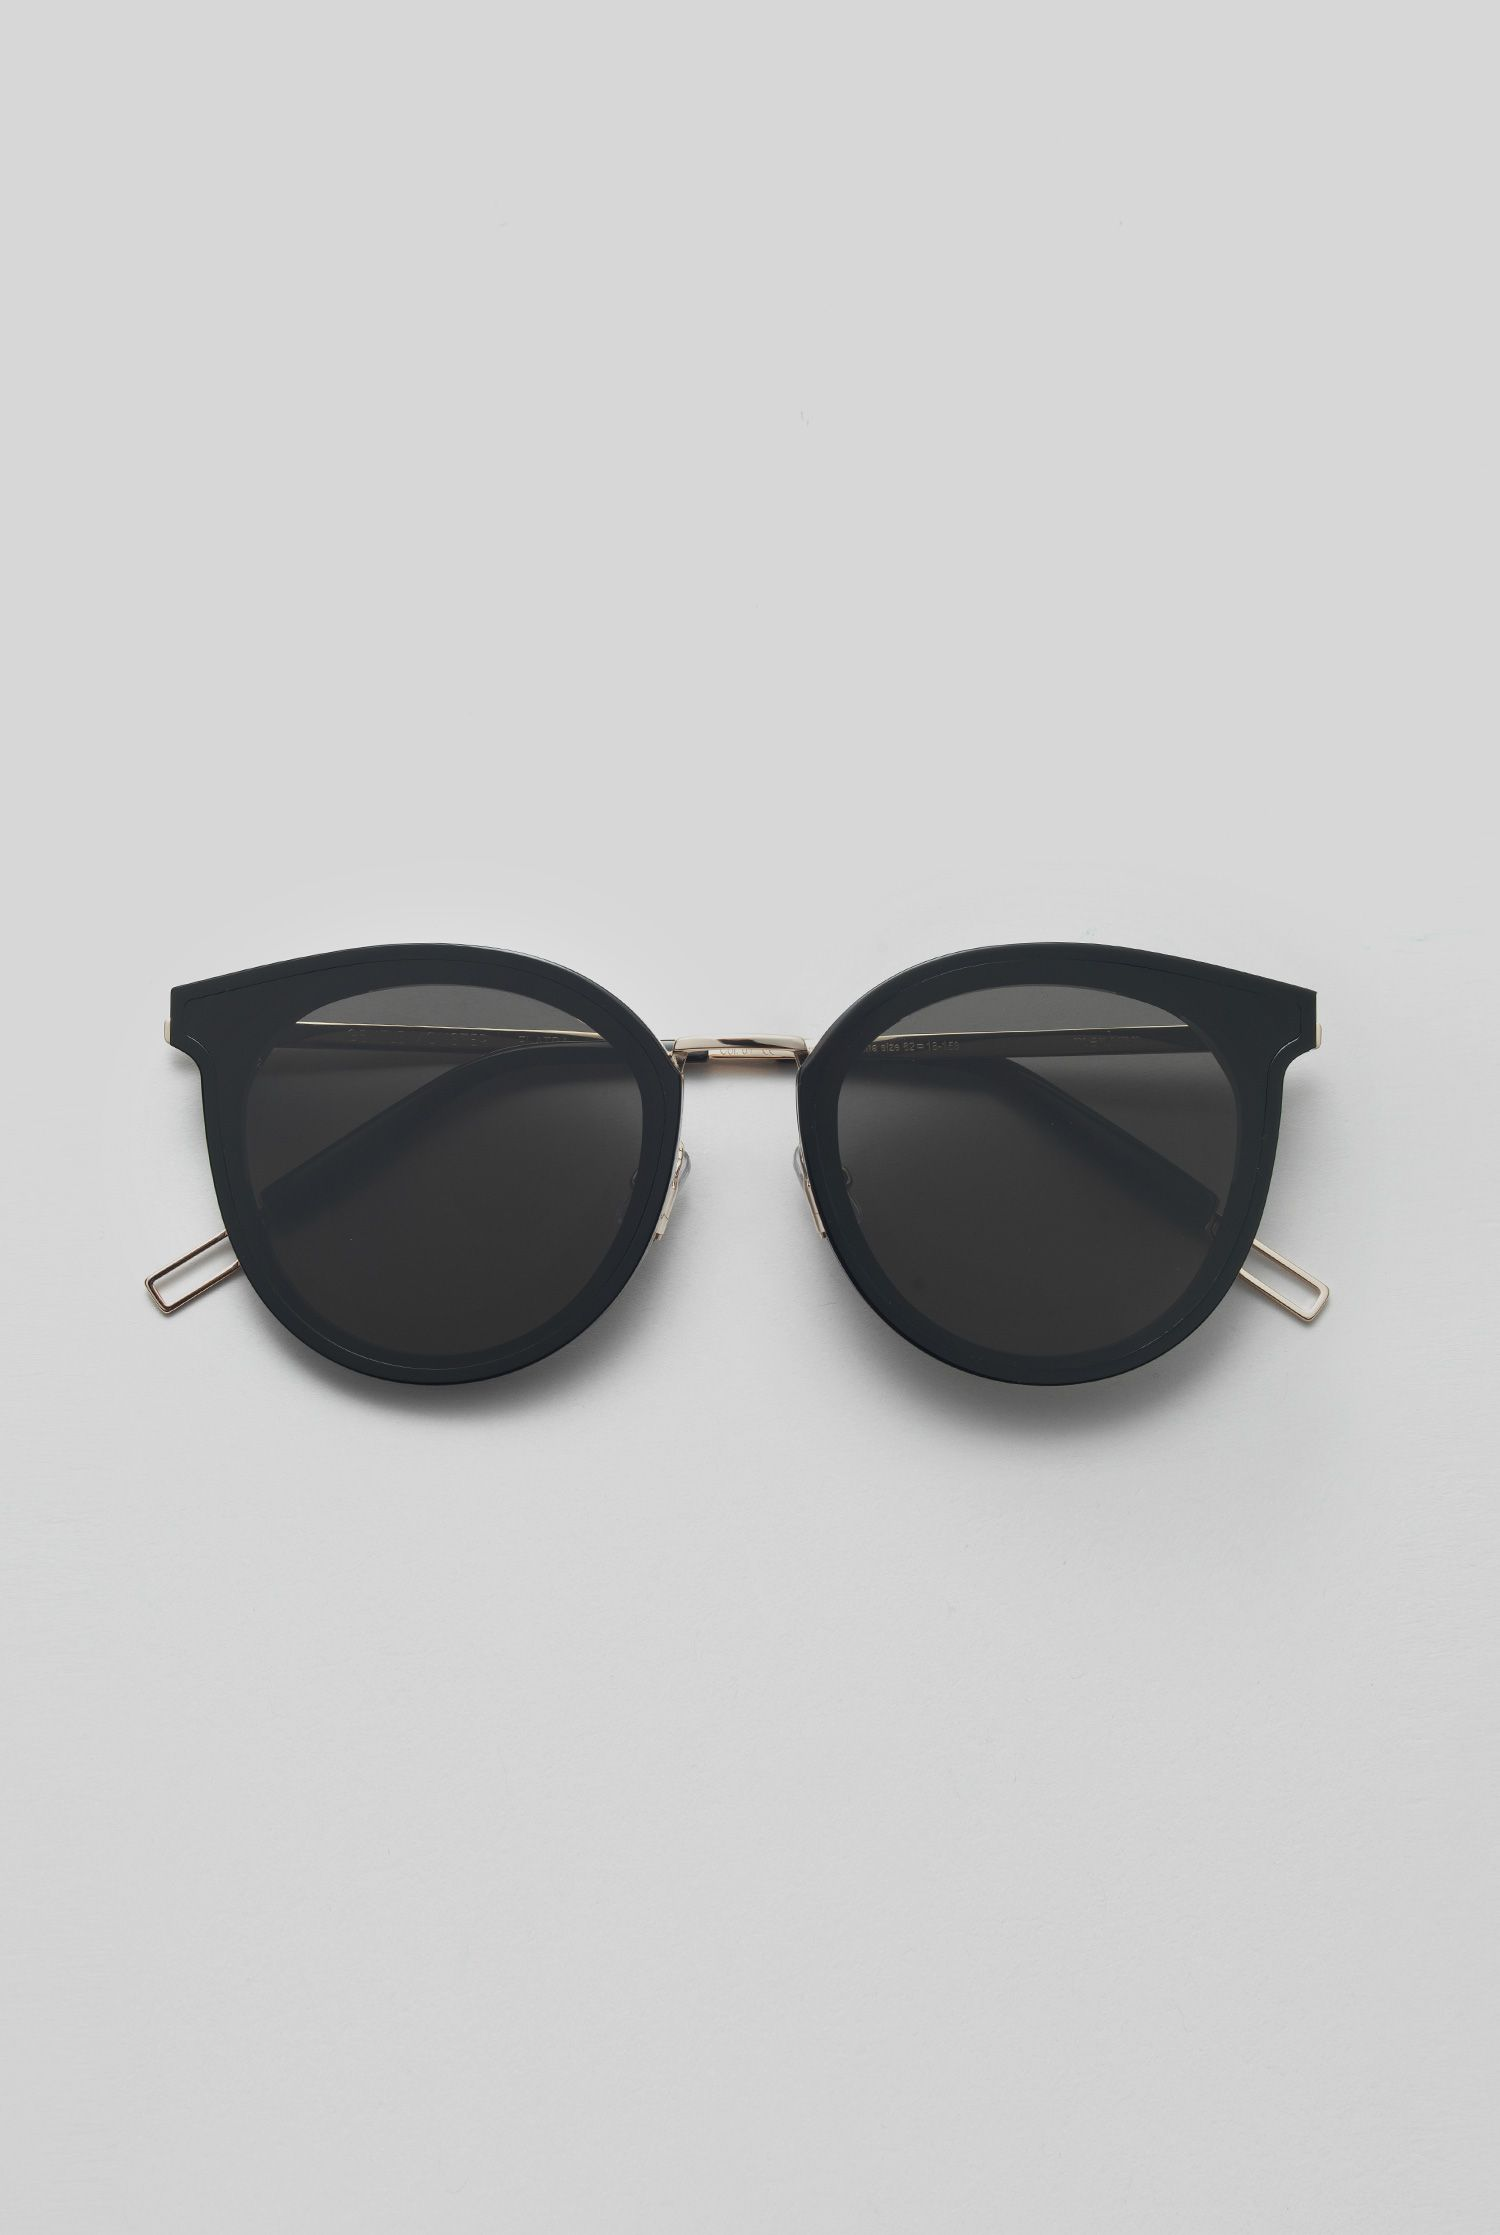 684c3130580 GENTLE MONSTER 2018 Sunglasses MERLYNN 01 FLATBA